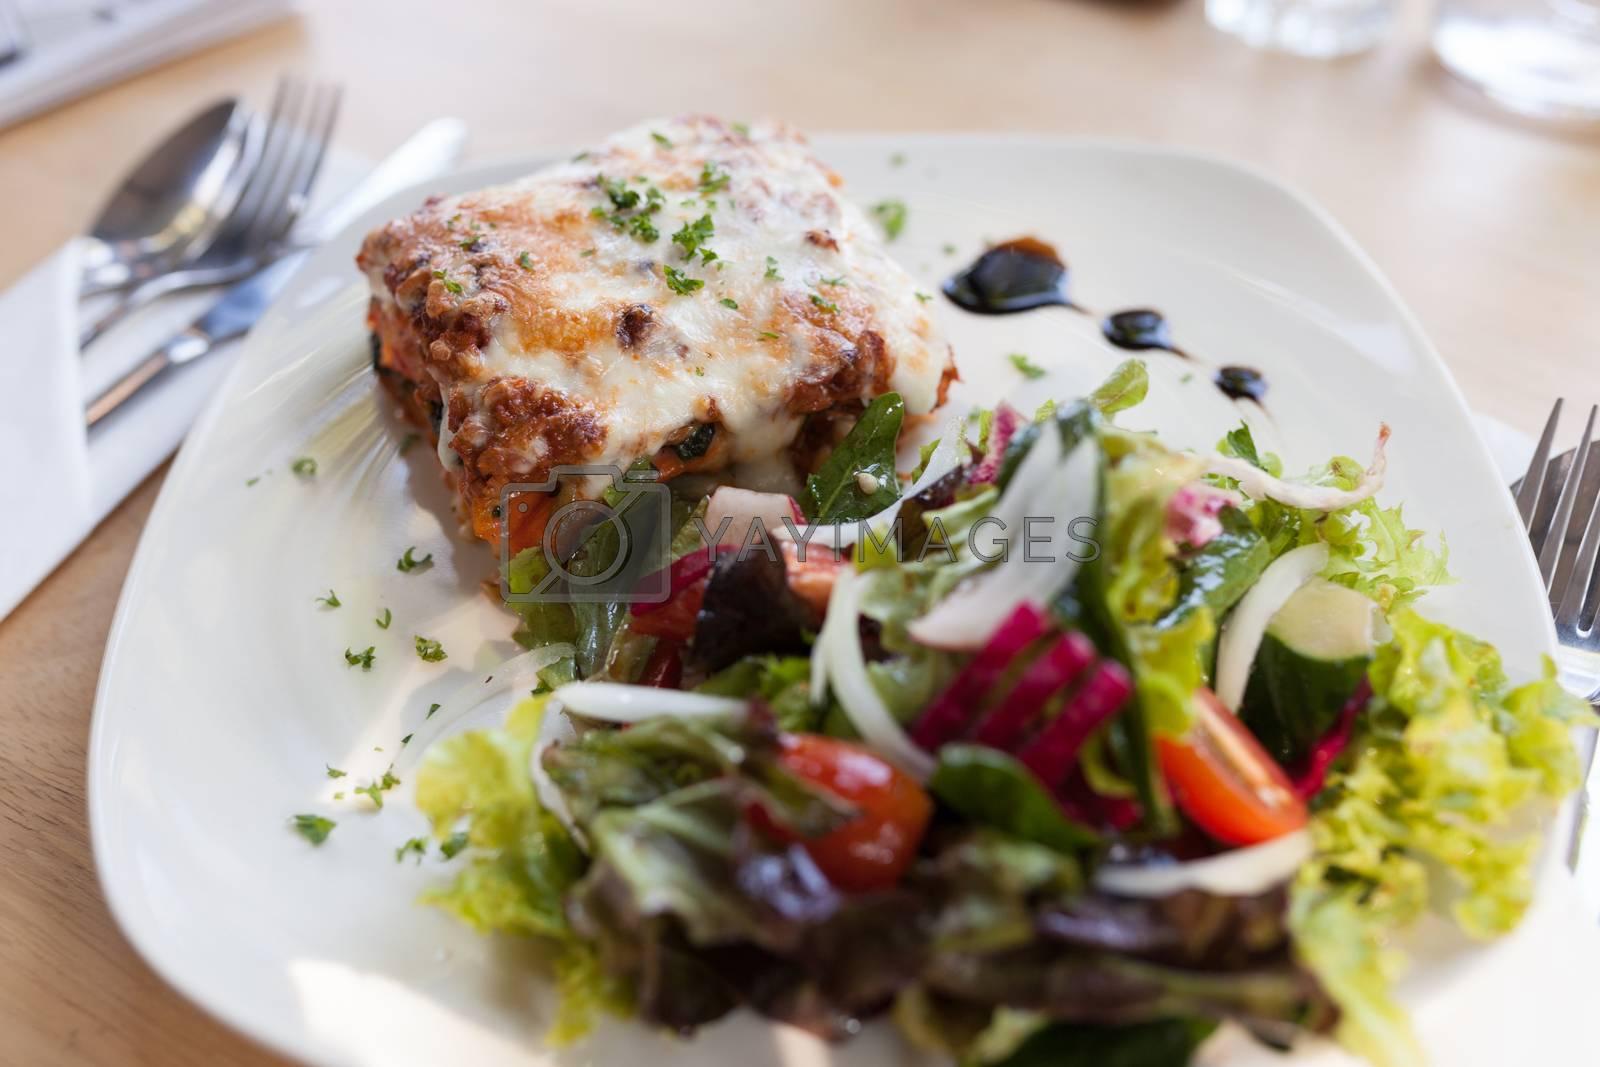 Authentic Italian Meat Lasagna with fresh salad.